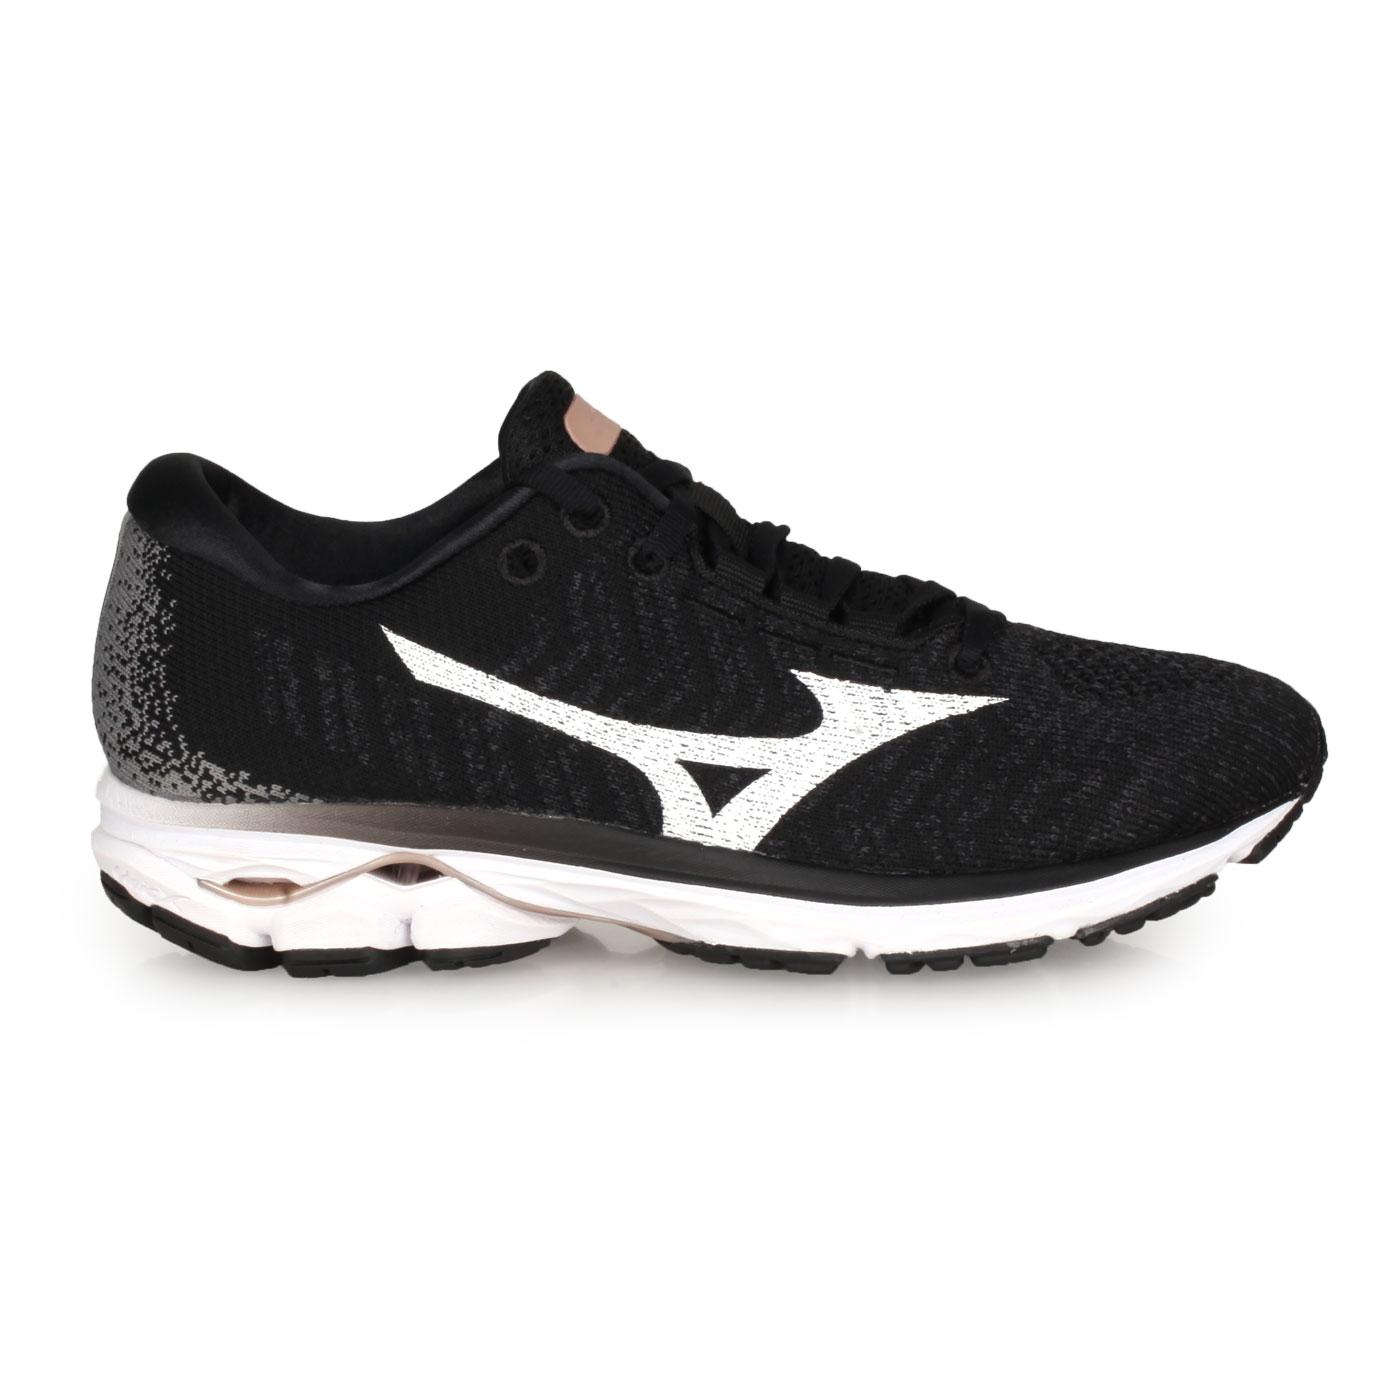 MIZUNO 女款慢跑鞋  @WAVE RIDER WAVEKNIT 3@J1GD192902 - 黑白灰